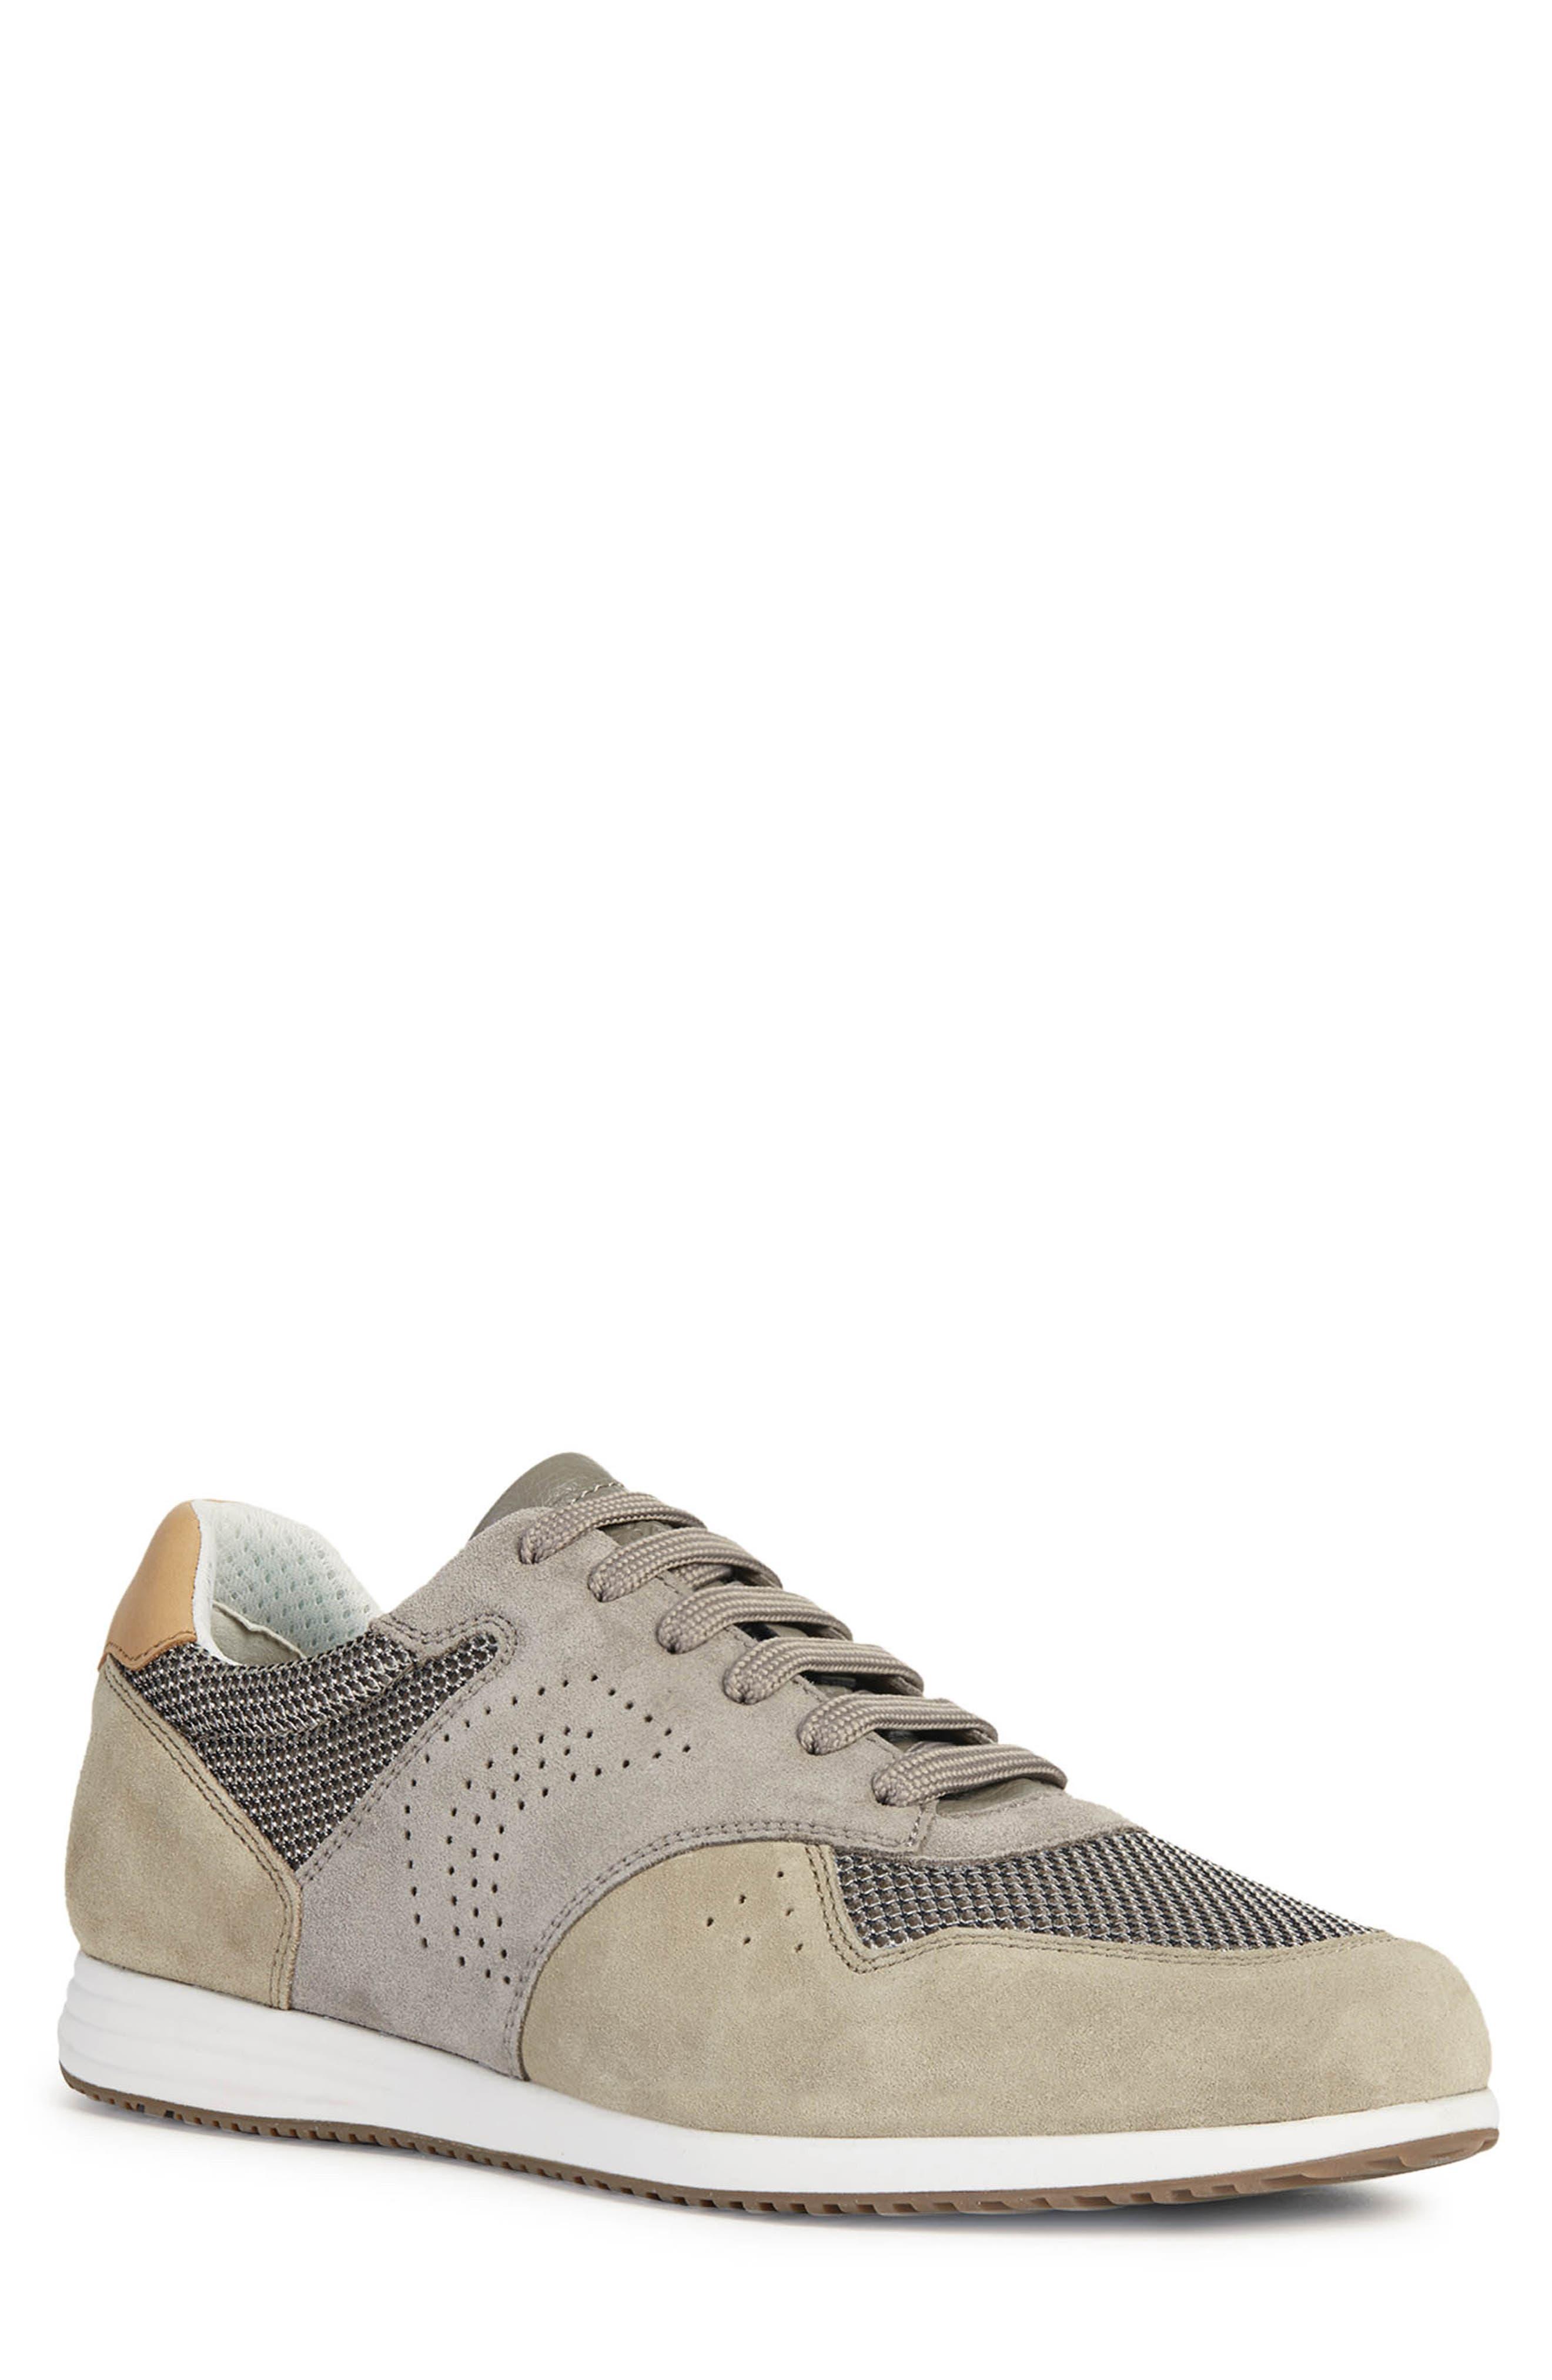 Geox Arsien 1 Sneaker, Grey